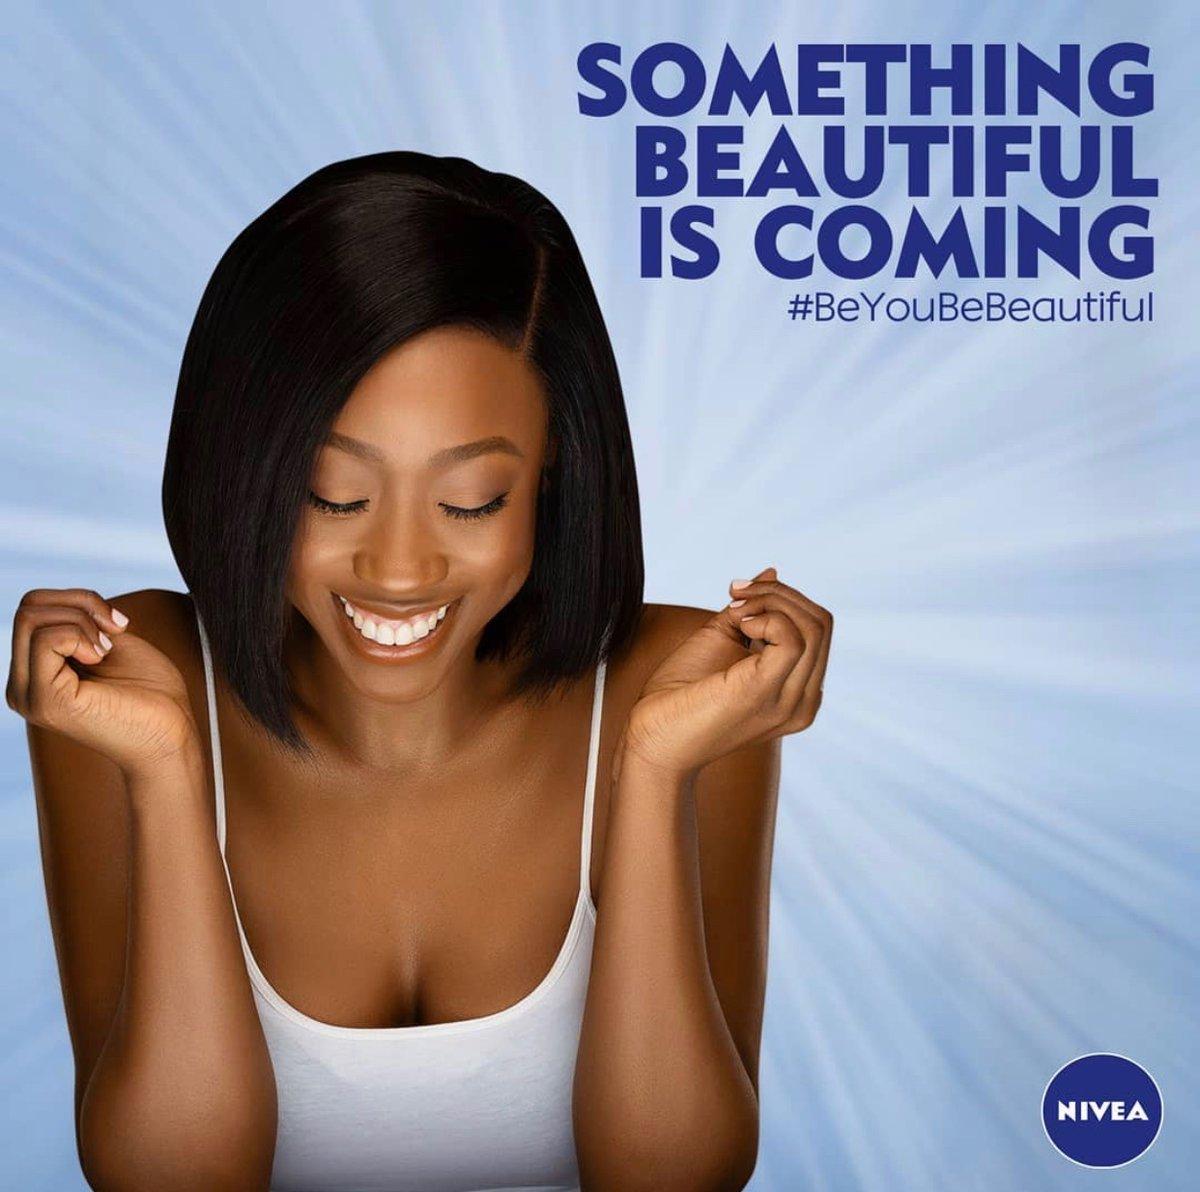 Something beautiful is coming...  #BeYouBeBeautiful 💙 https://t.co/whG77xP6wR